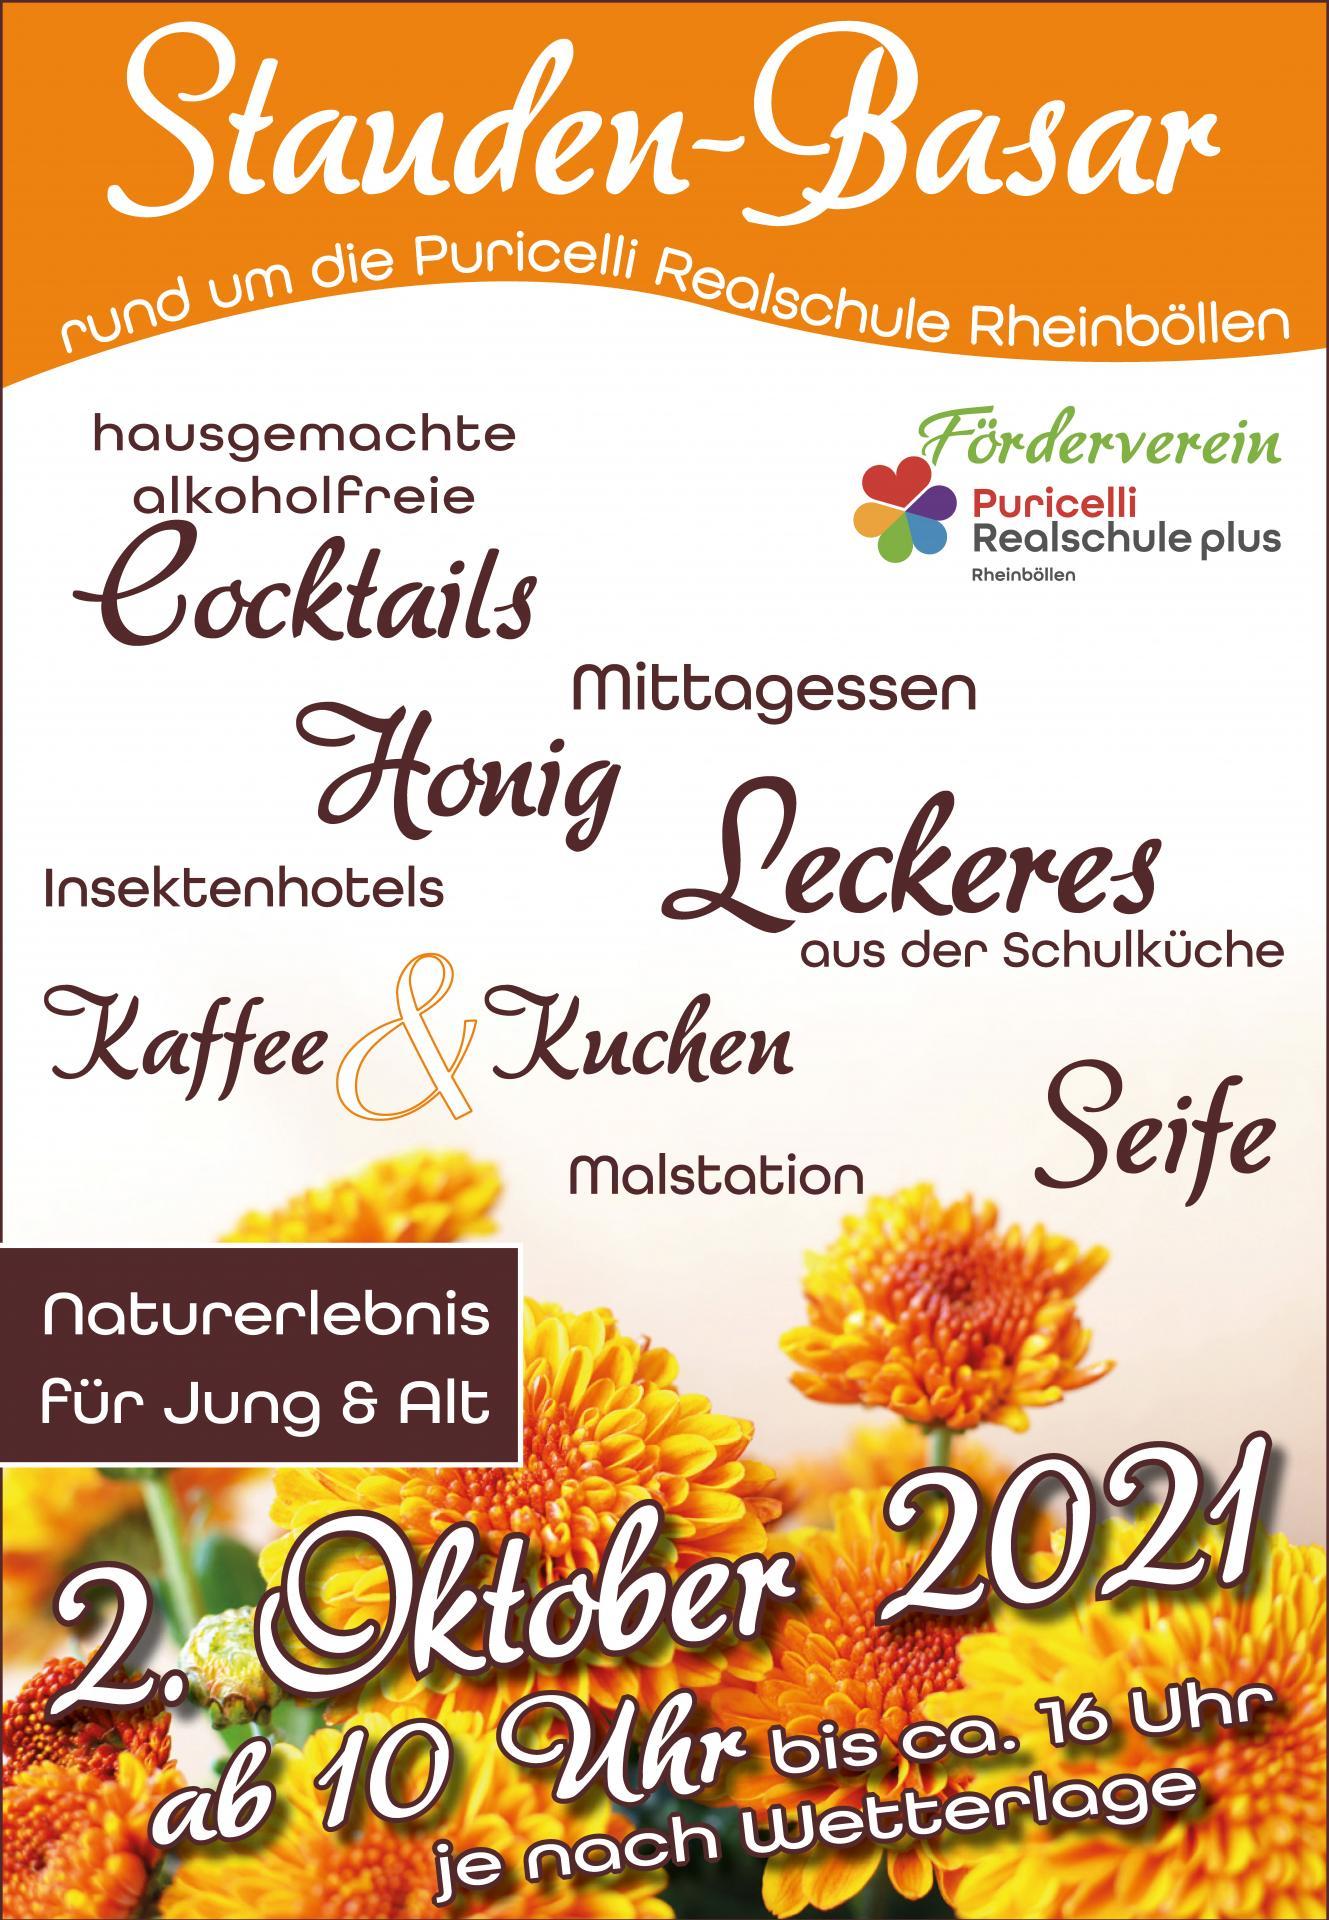 Anzeige Förderverein für Amtsblatt